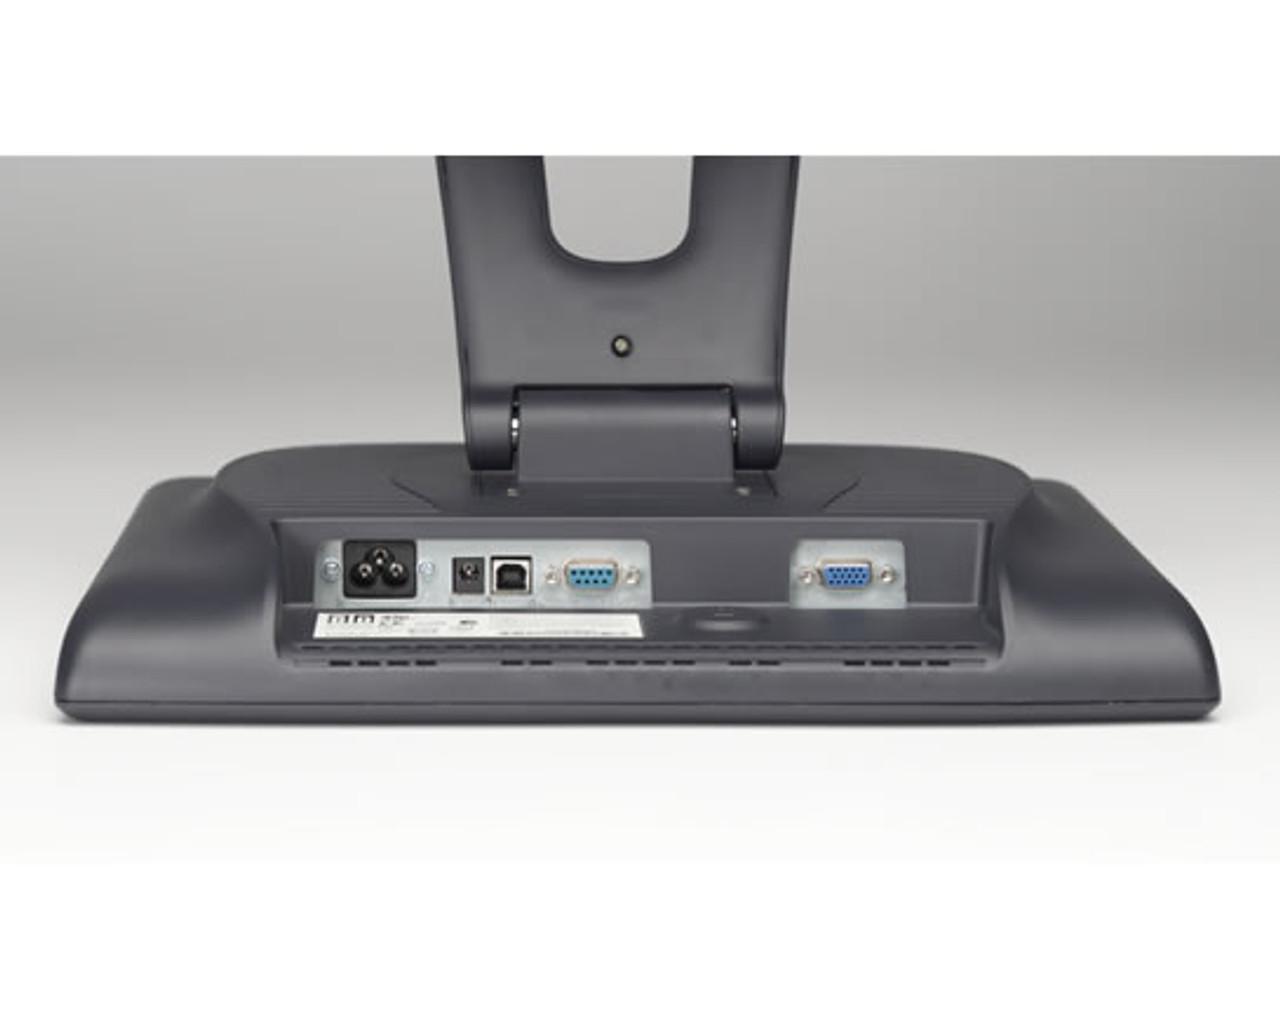 elo touch screen monitor, touch screen pos terminal